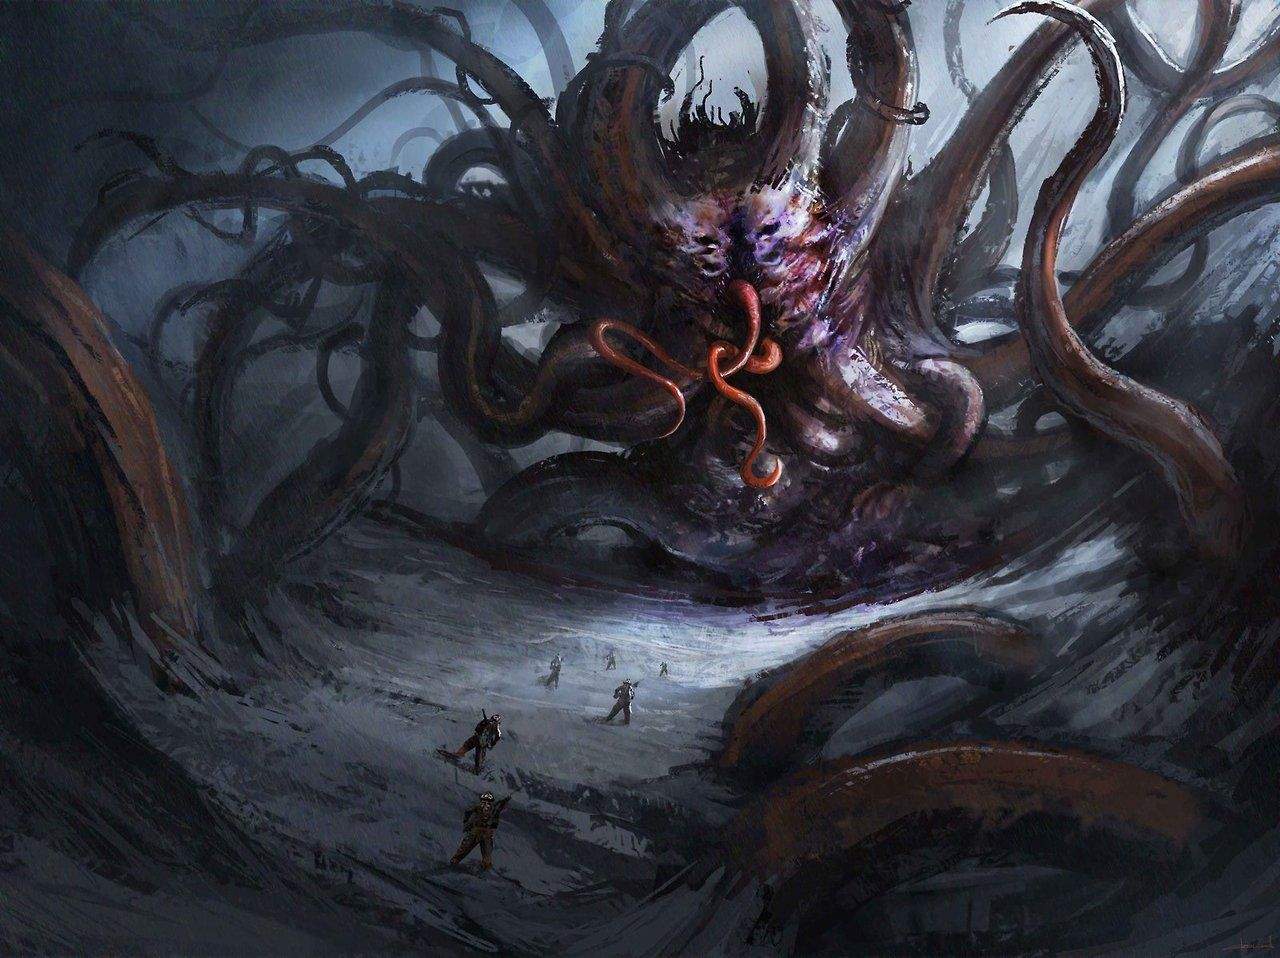 shoggoth - Buscar con Google | Lovecraft art, Lovecraftian horror, Cthulhu